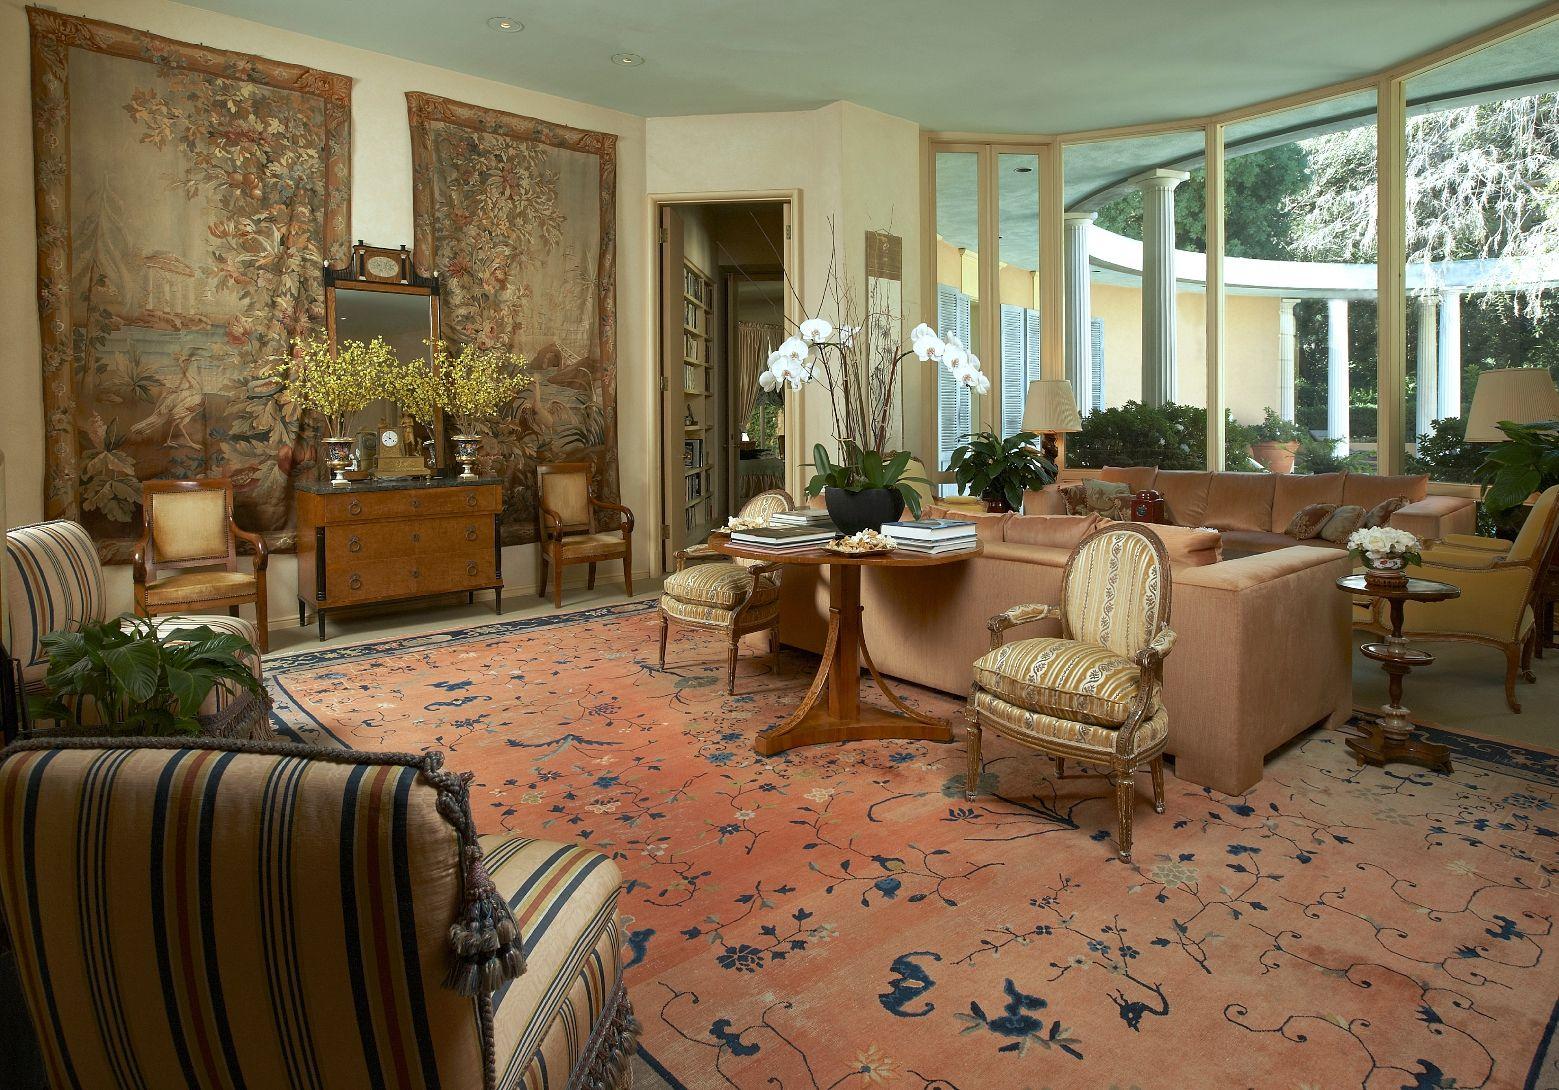 http://2.bp.blogspot.com/--qcWG3VtJW0/T8jaPYeSA3I/AAAAAAAAHJY/3uOcU1BXjXQ/s1600/Mengers-Home-Interior3-small.jpg